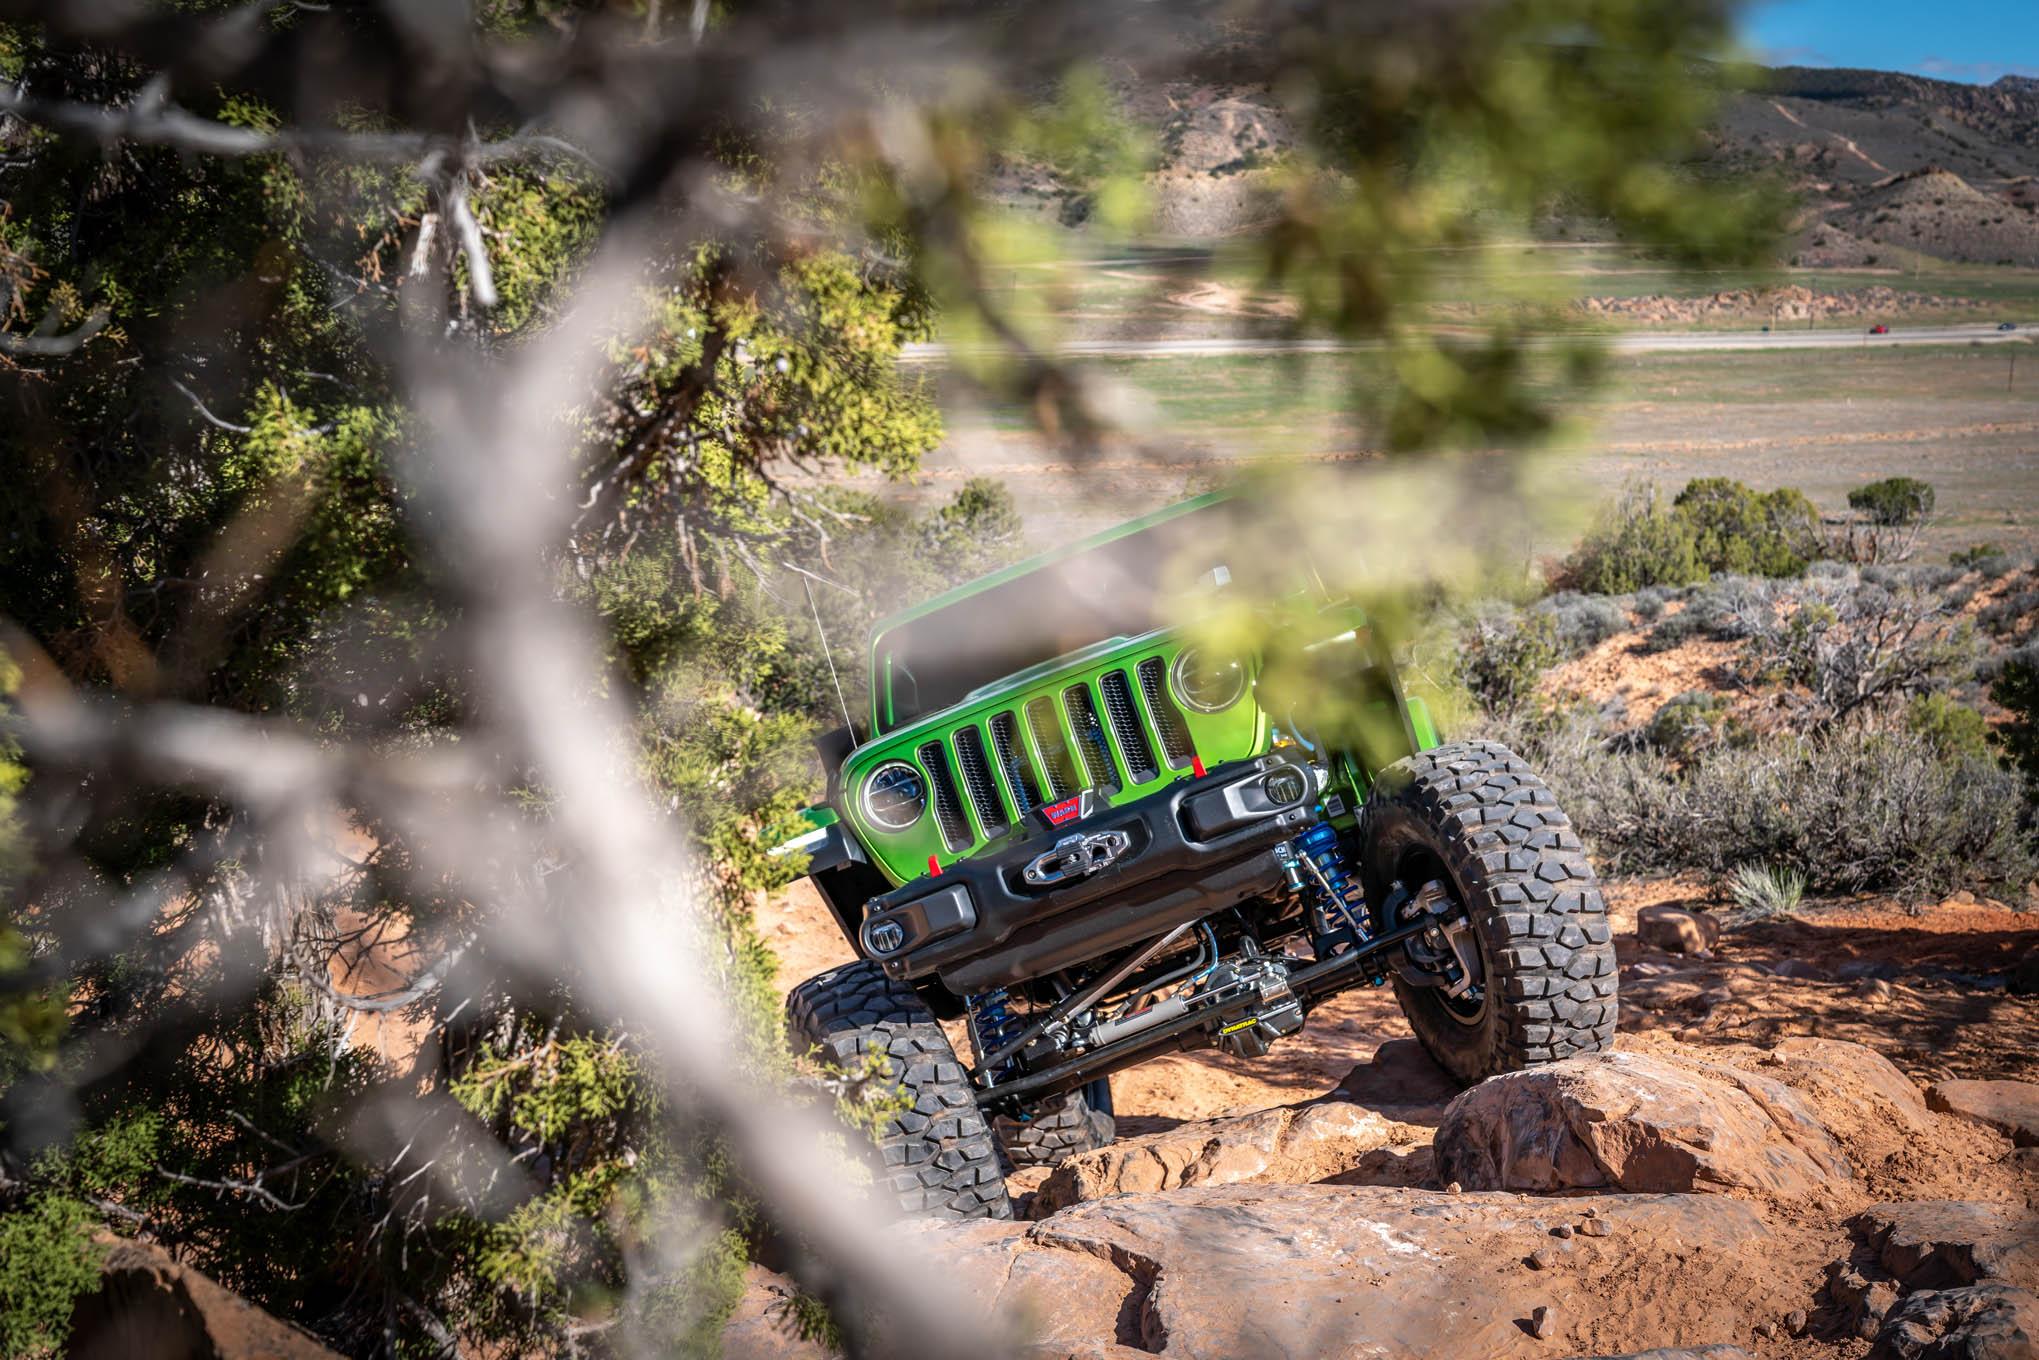 0019 2018 jeep wrangler unlimited rubicon dynatrac prorock 42 dixie 4 wheel drive